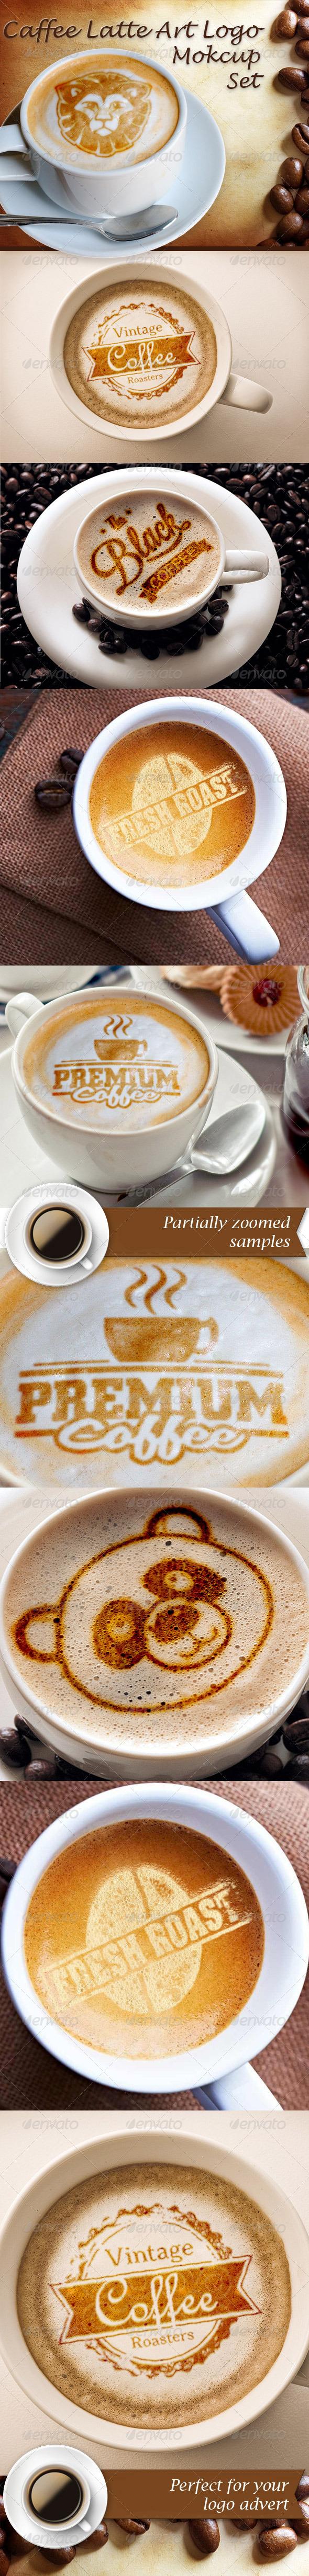 Caffee Latte Art Logo Mockup Set - Logo Product Mock-Ups